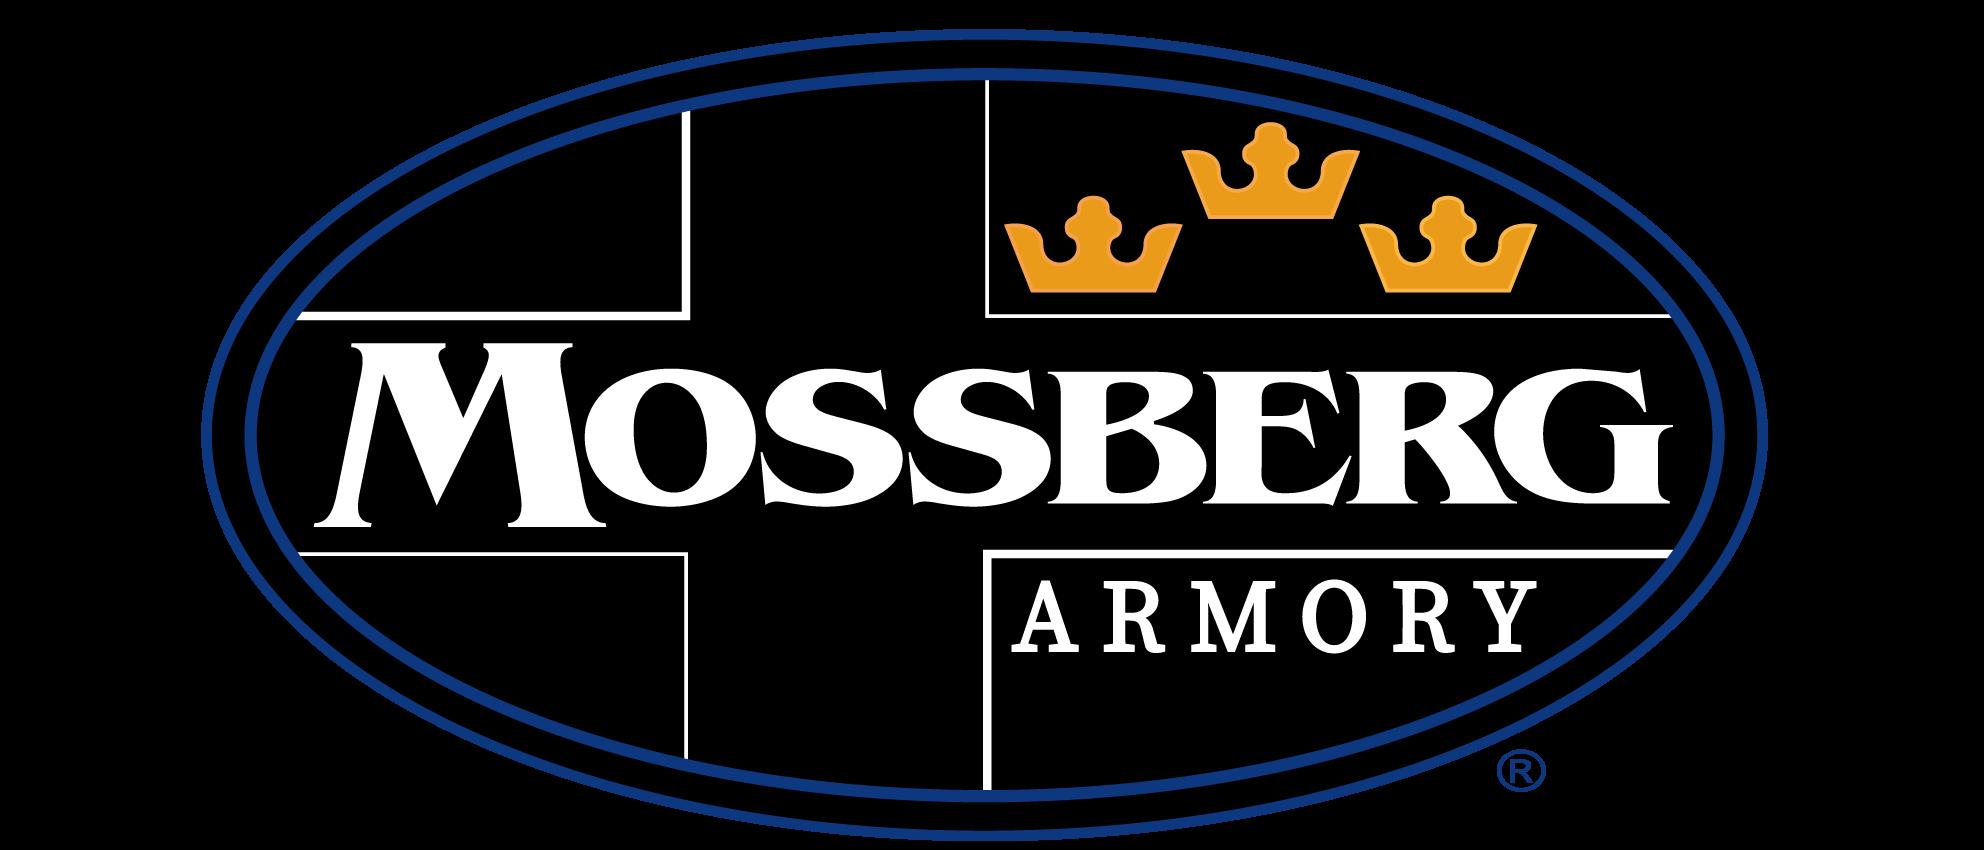 Mossberg Armory USA